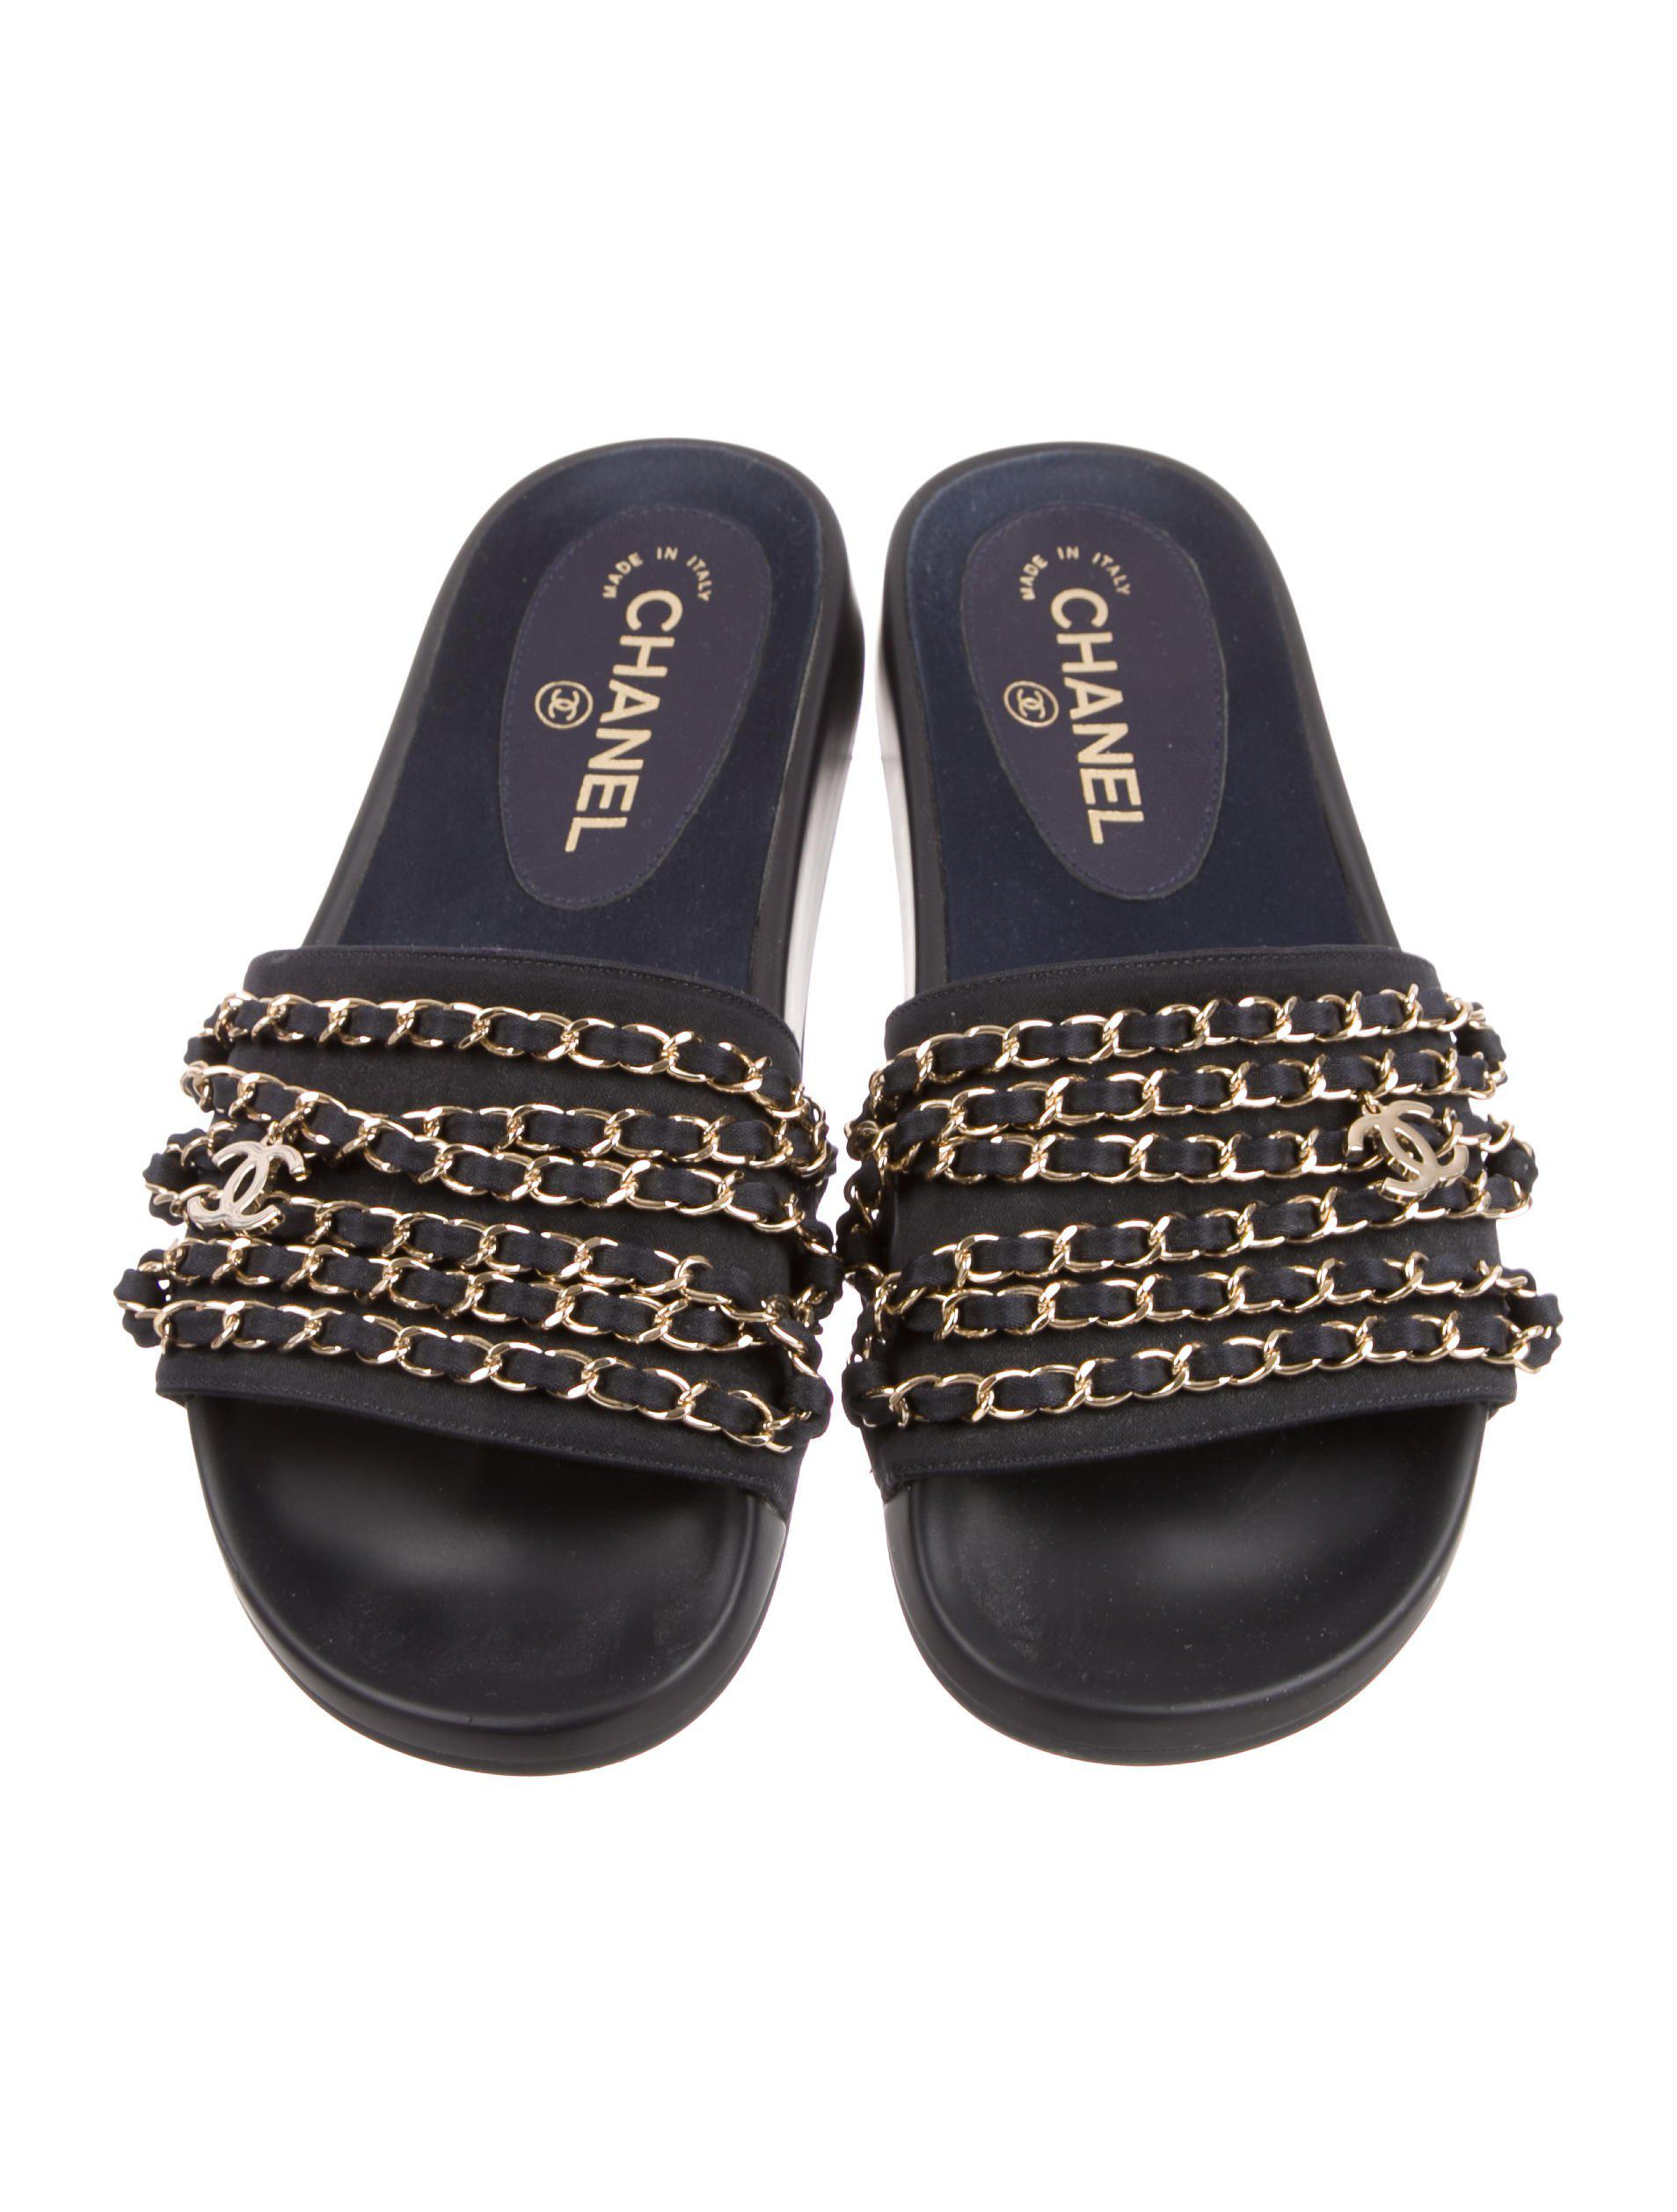 f1b3b5ee061a Lyst - Chanel Tropiconic Slide Sandals Navy in Metallic